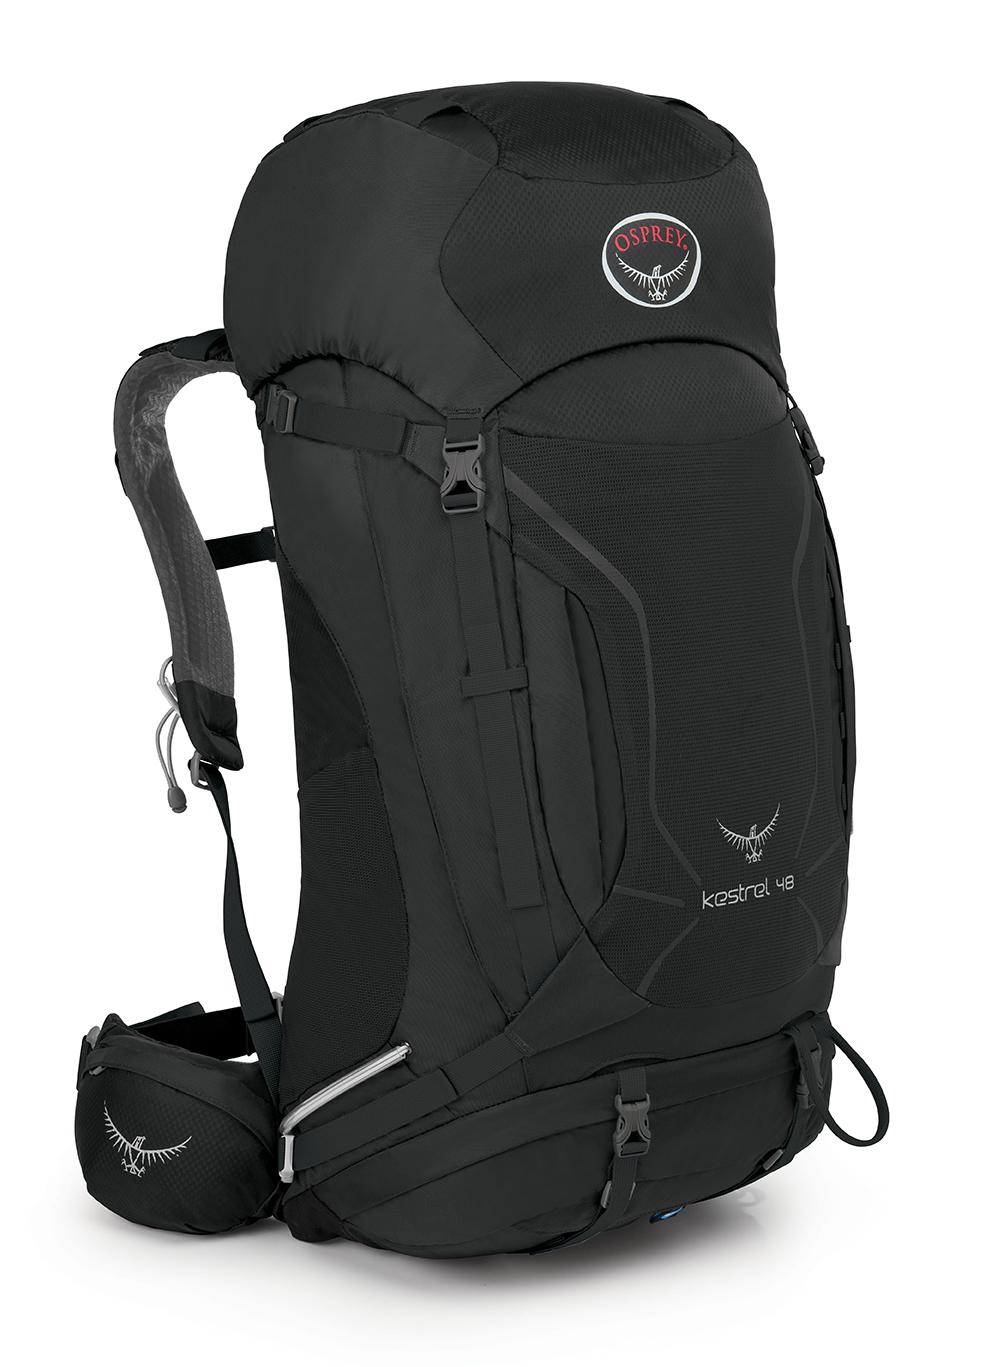 Osprey - Kestrel 48 - Mochila trekking - Hombre